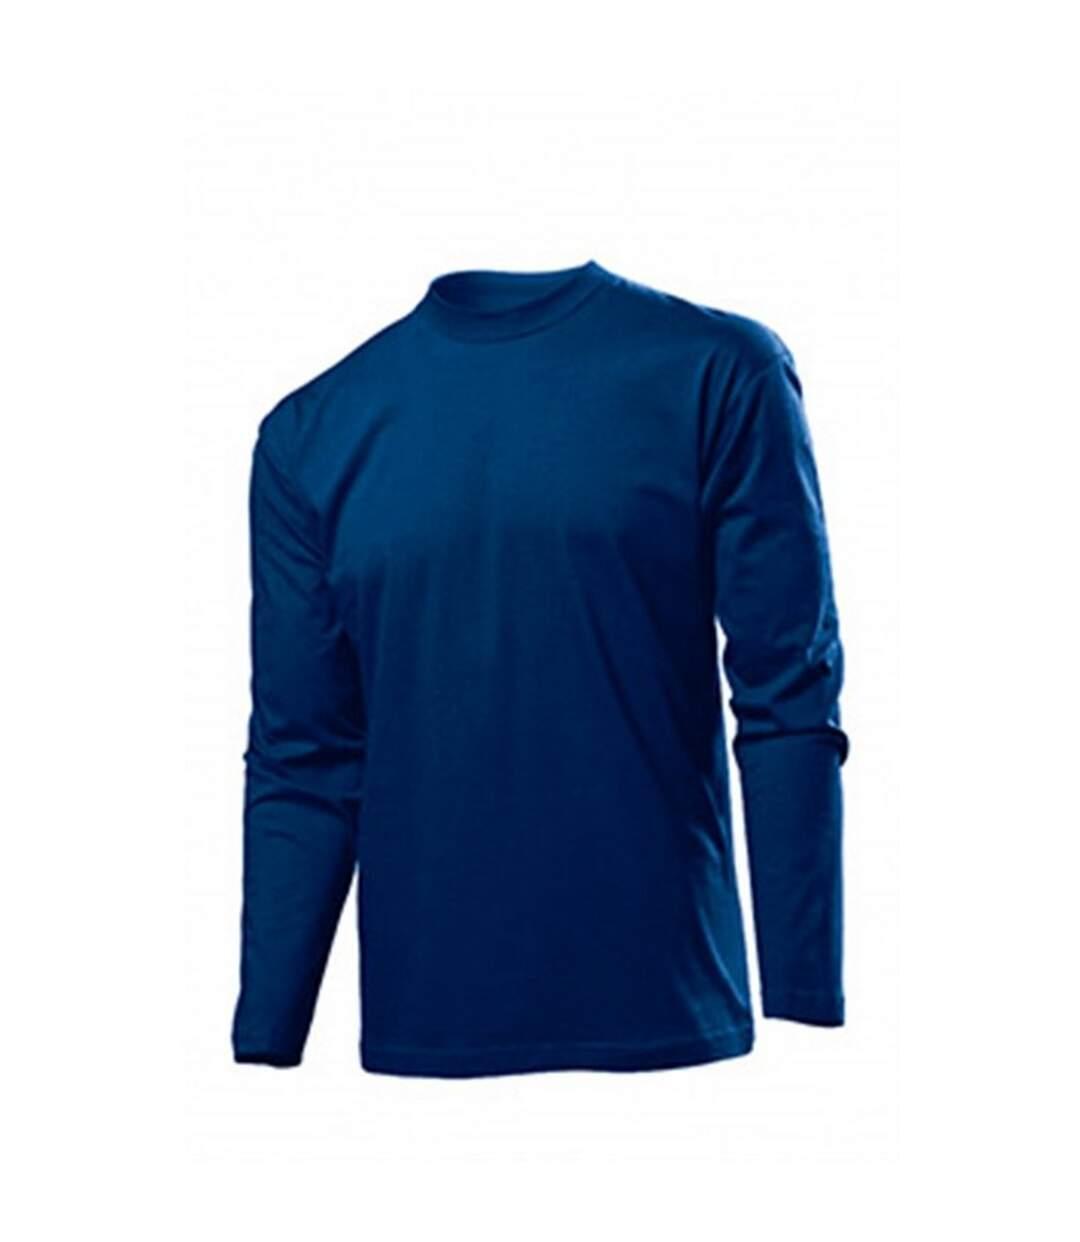 Stedman Mens Classic Long Sleeved Tee (Blue Midnight) - UTAB277